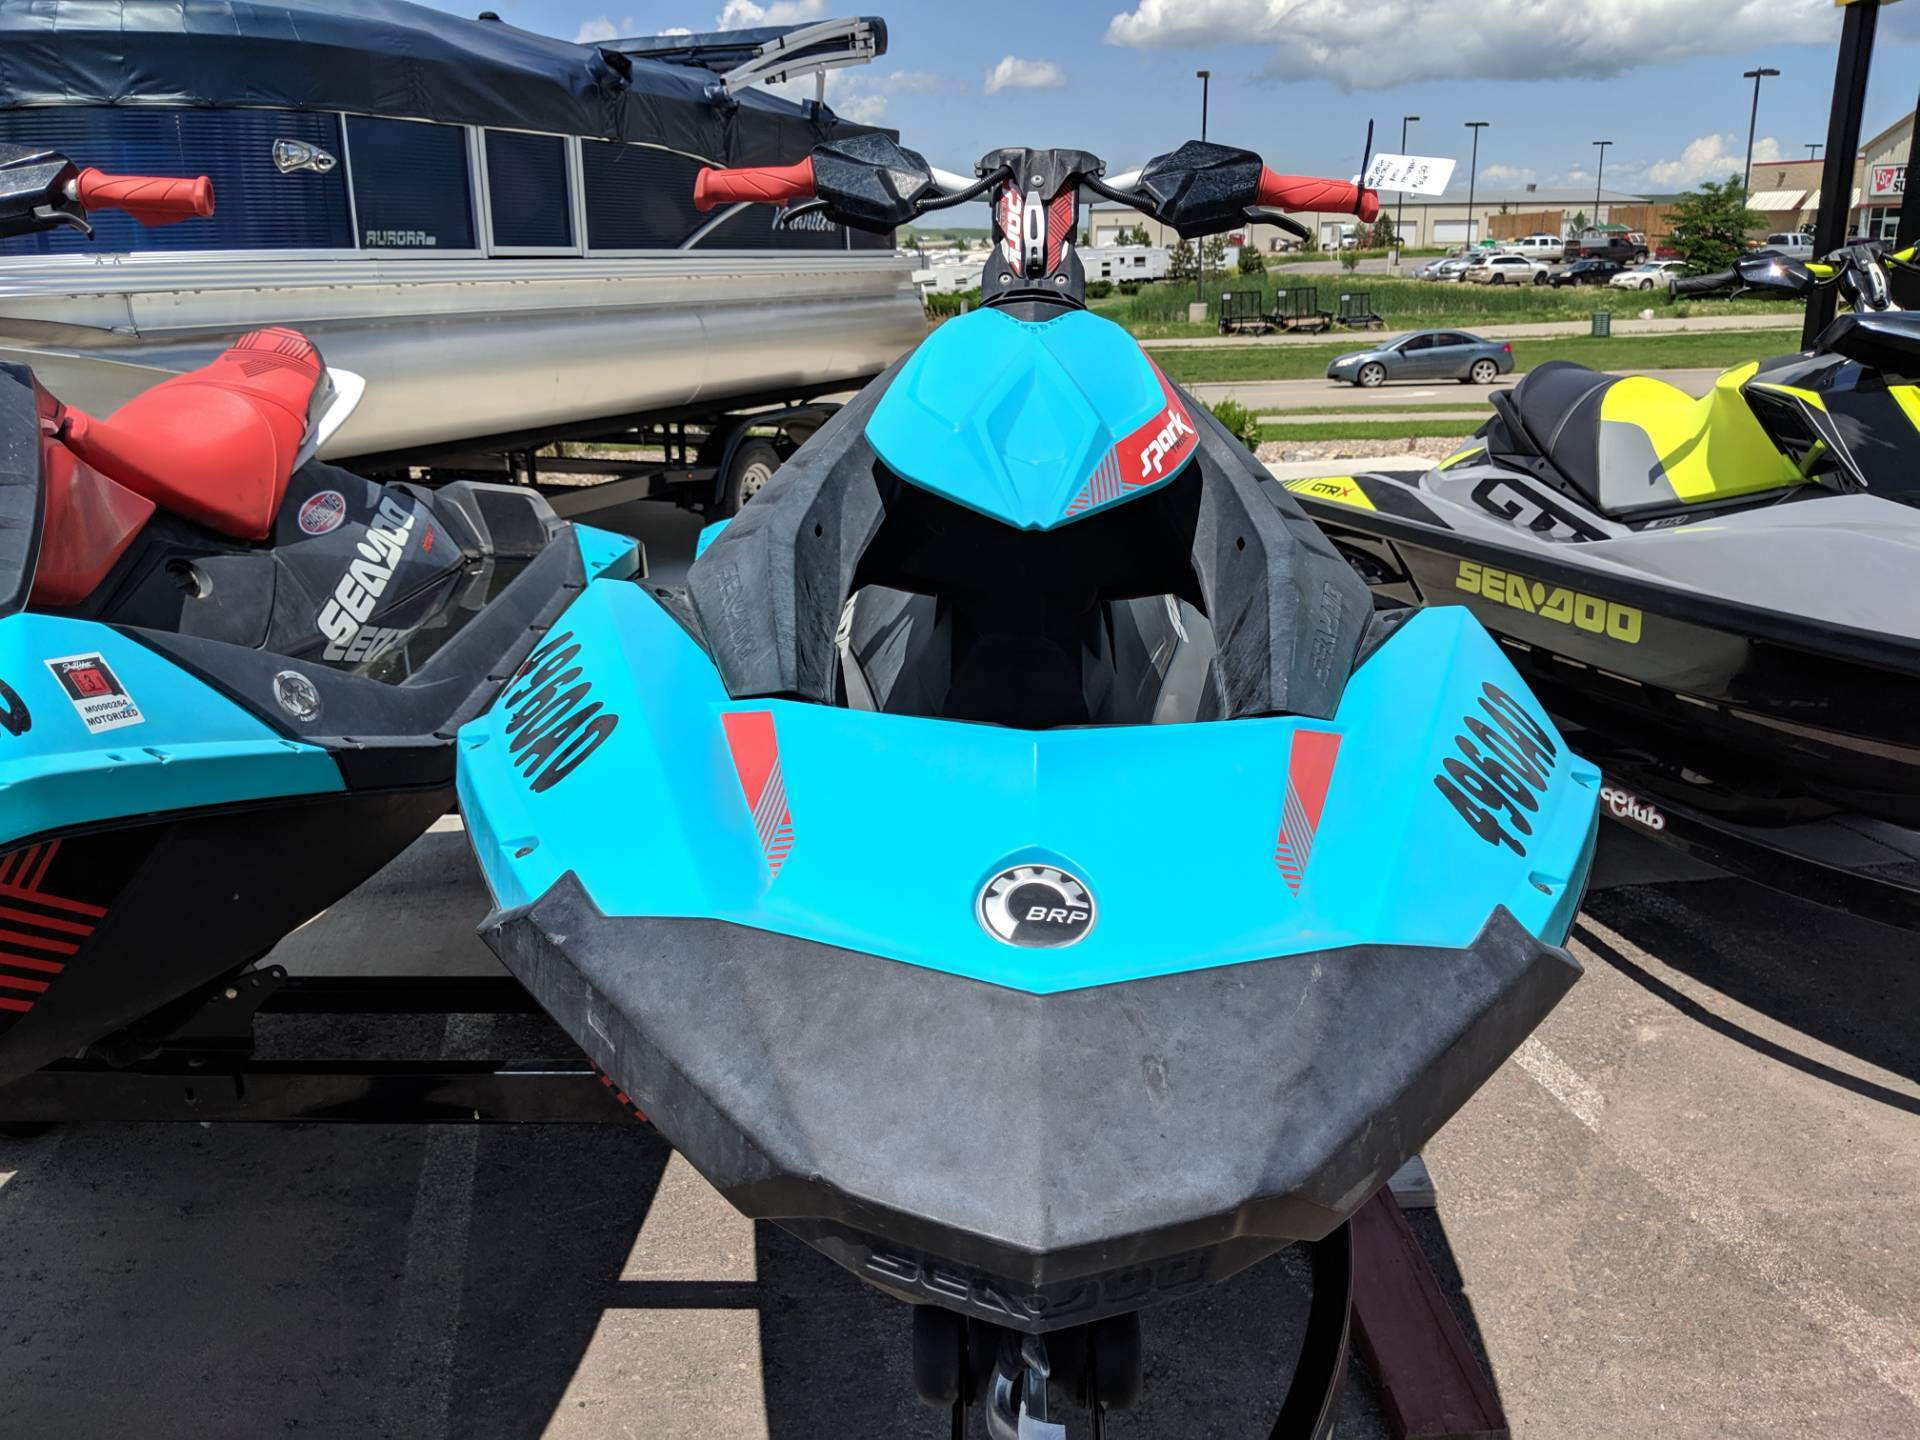 2017 Sea-Doo Spark 2up Trixx iBR in Rapid City, South Dakota